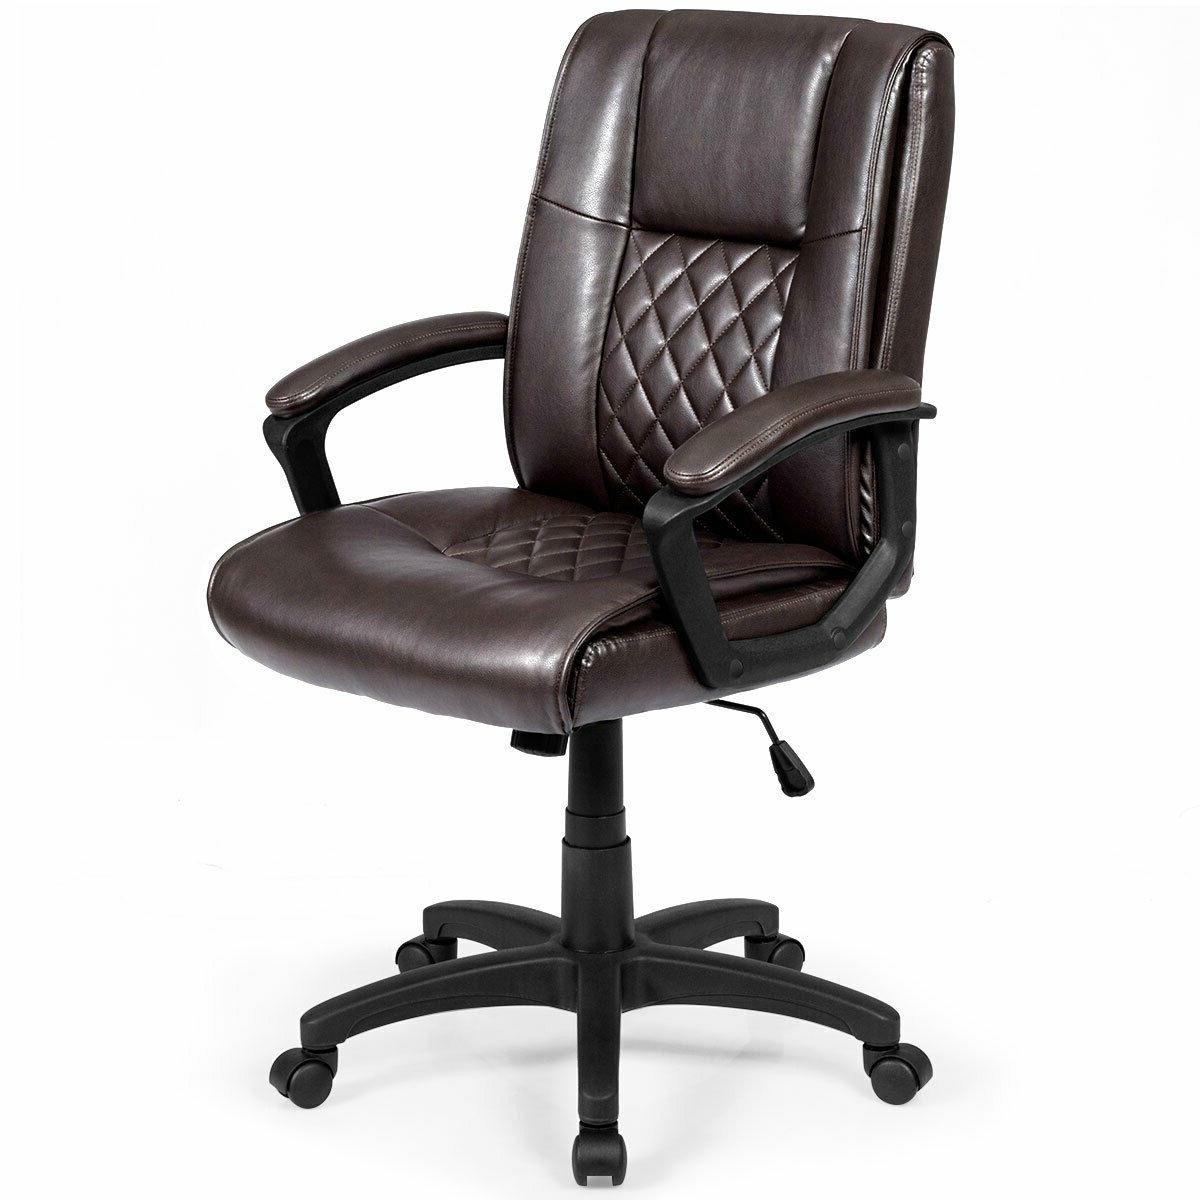 Phenomenal Ergonomic Brown Faux Leather Mid Back Office Chair Spiritservingveterans Wood Chair Design Ideas Spiritservingveteransorg